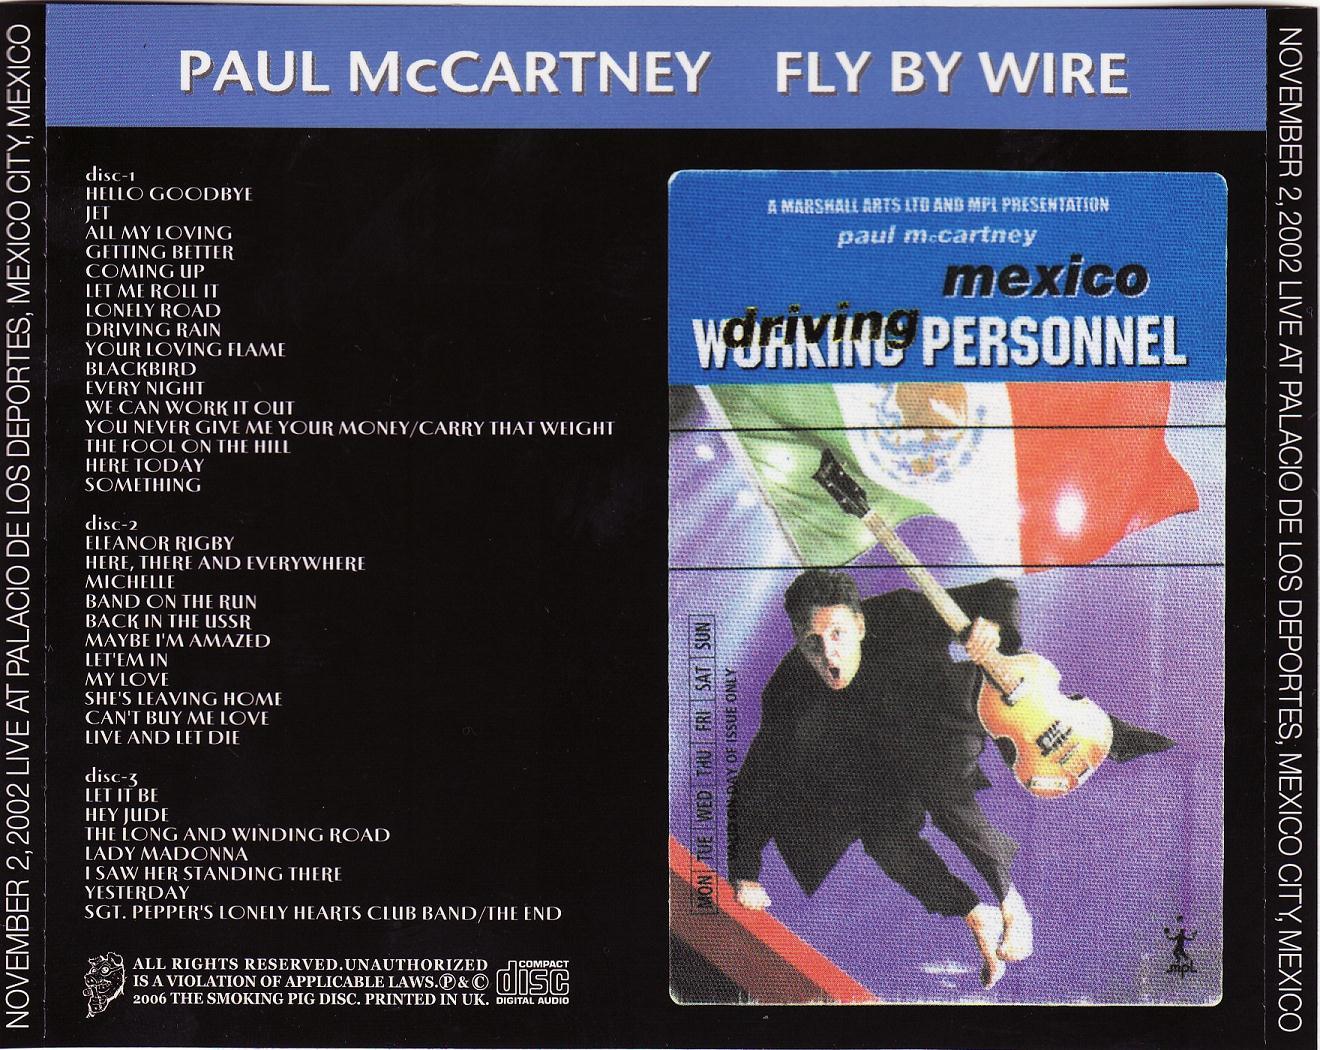 PAUL McCARTNEY – FLY BY WIRE – ACE BOOTLEGS